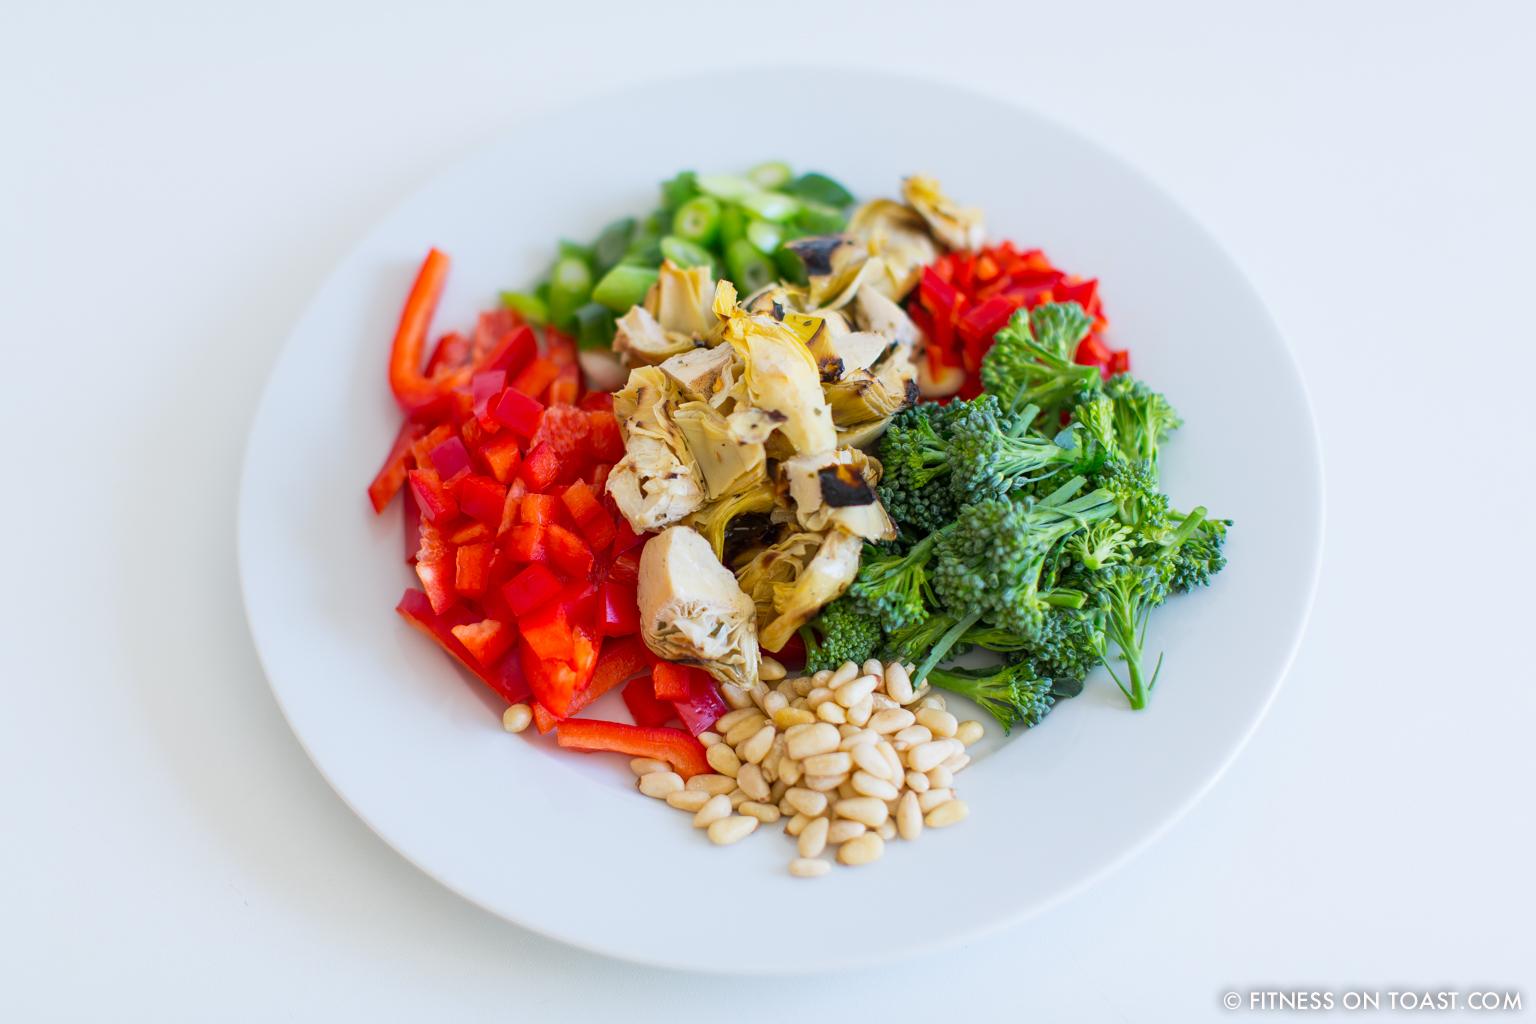 Asparagus And Broccoli Recipes Healthy